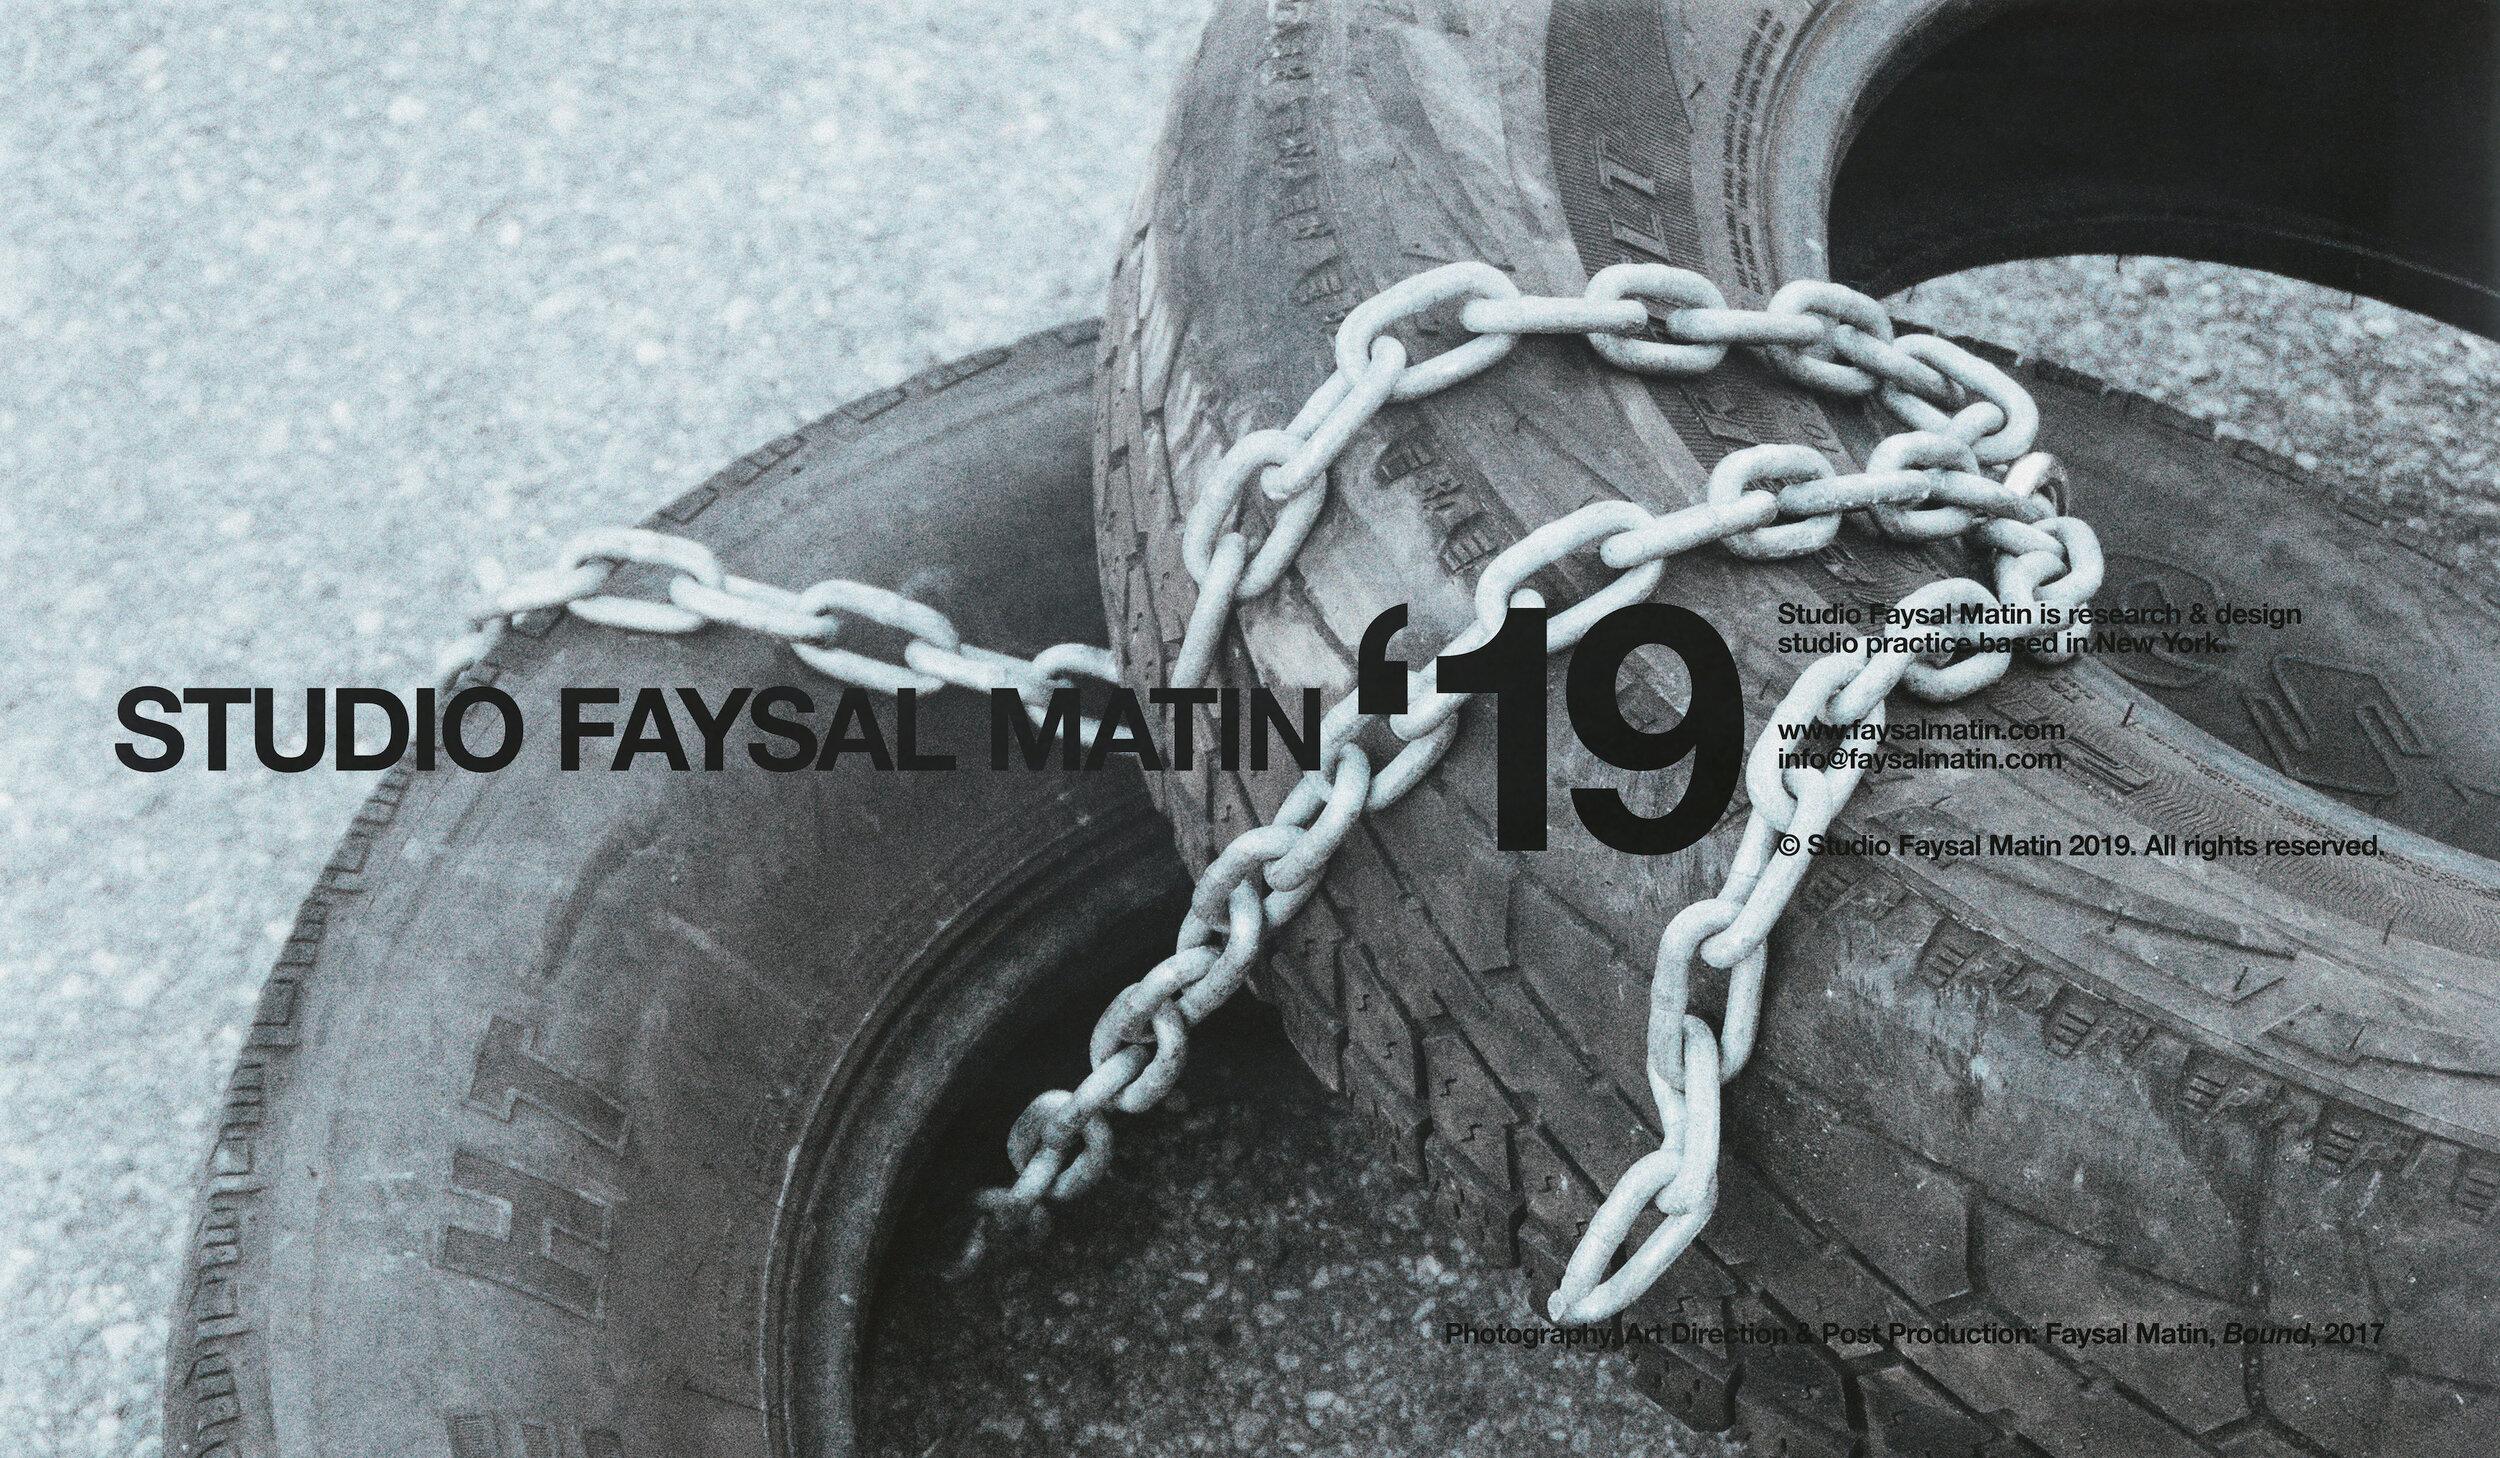 studio faysal matin poster bound 2017.jpg